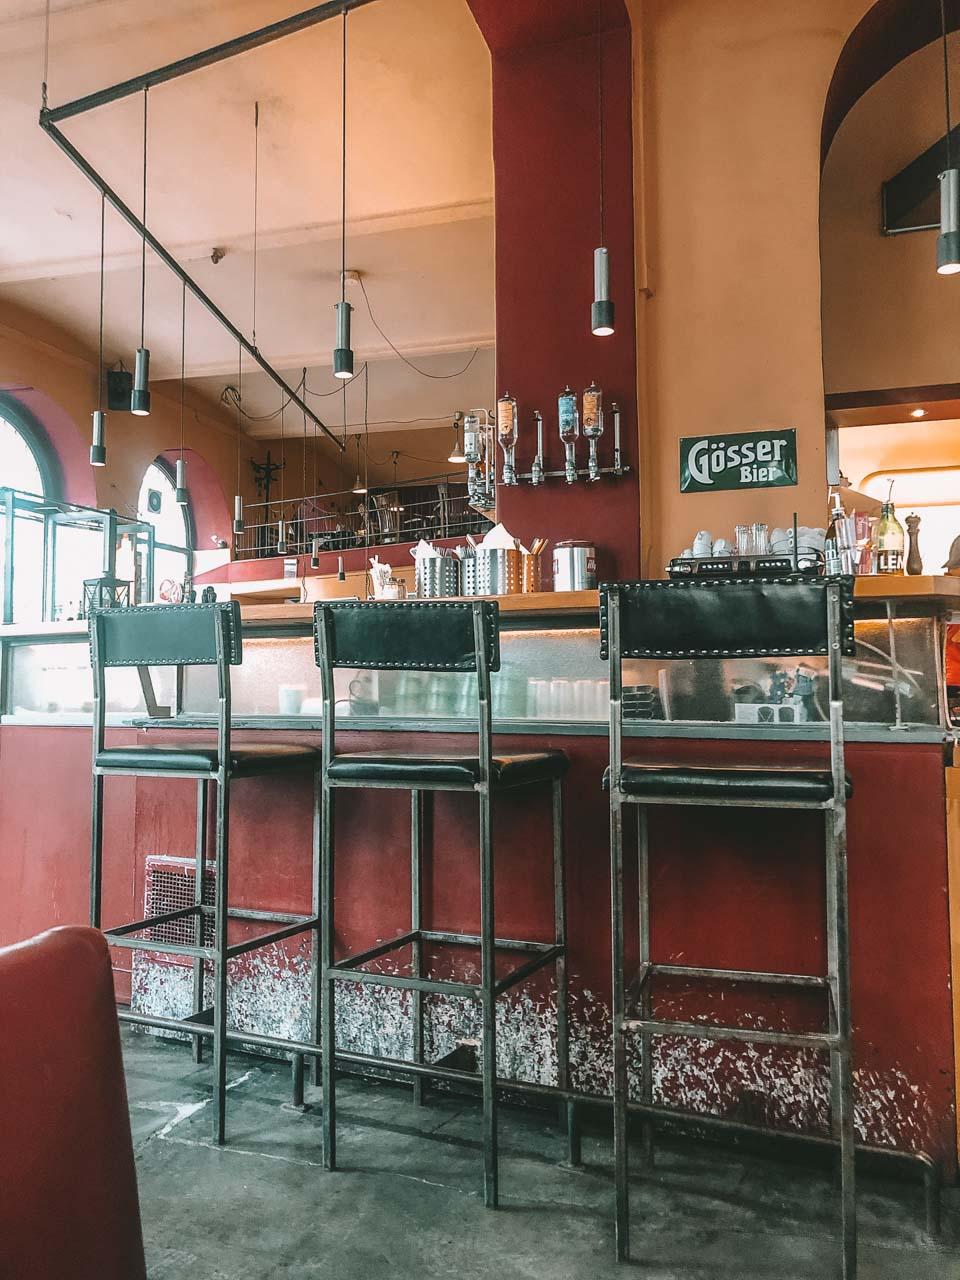 The inside of Café Aera in Vienna, Austria